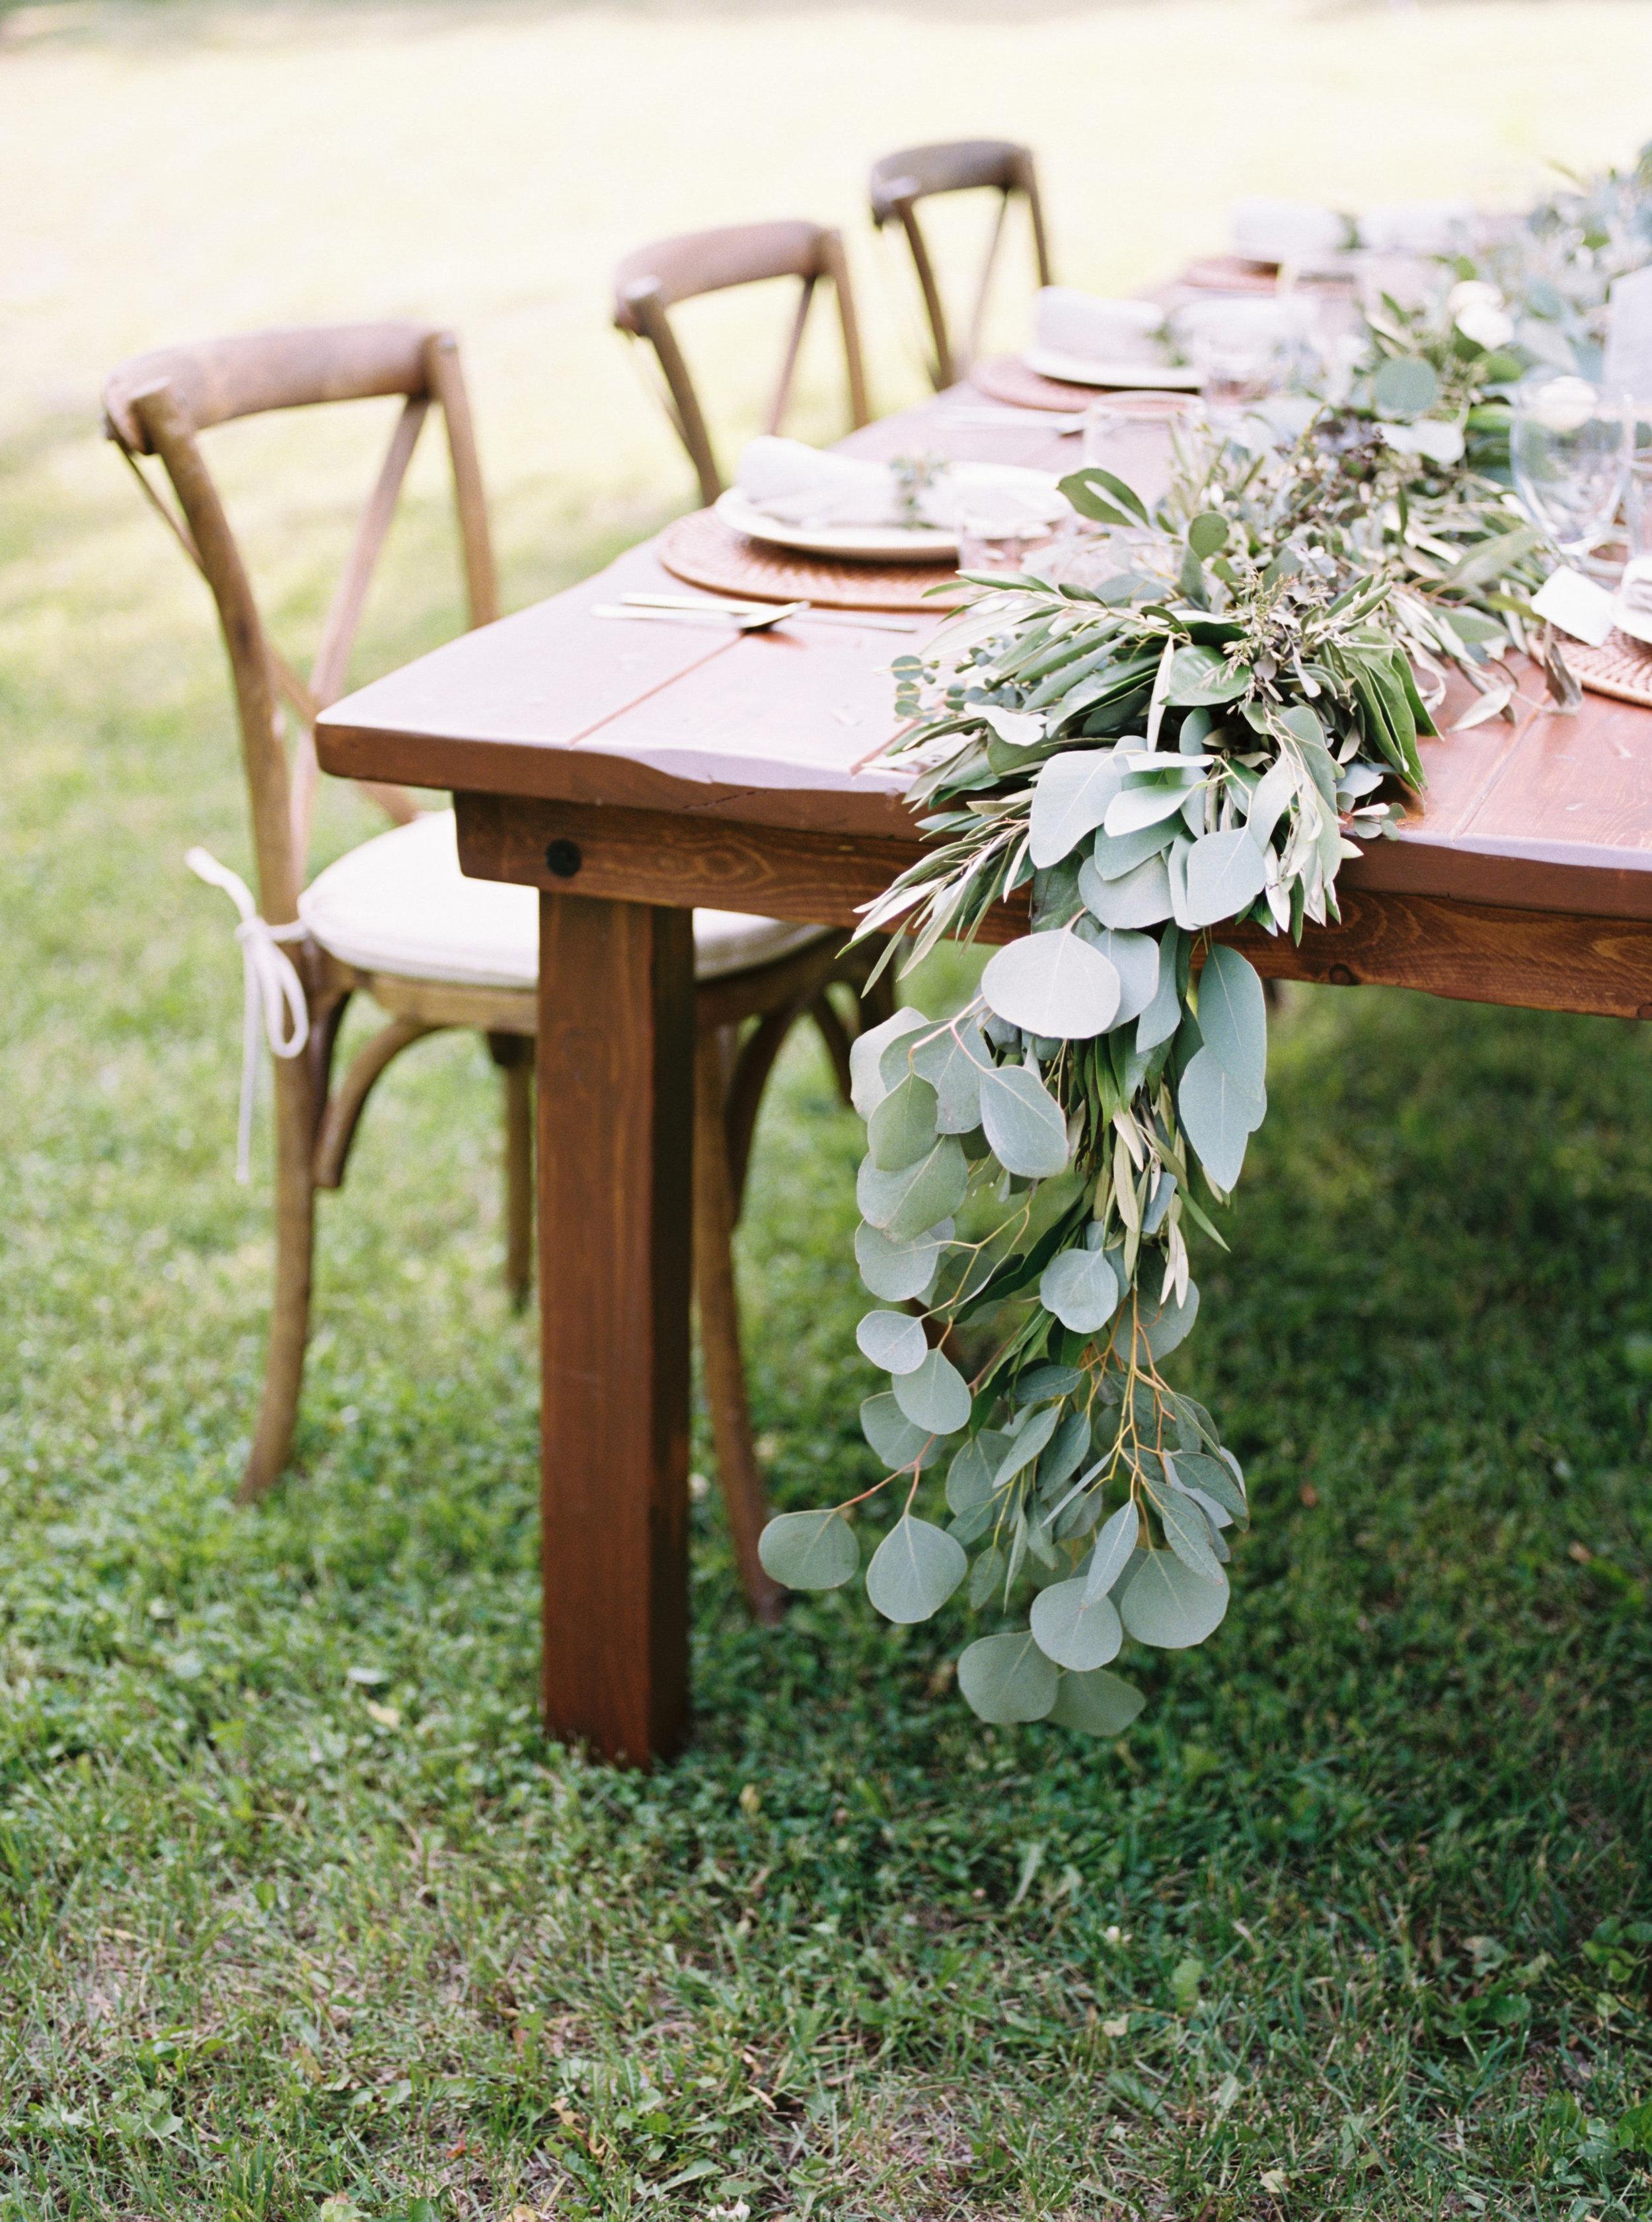 greenhouse-wedding-inspiration-by-laurelyn-savannah-photography-21.jpg